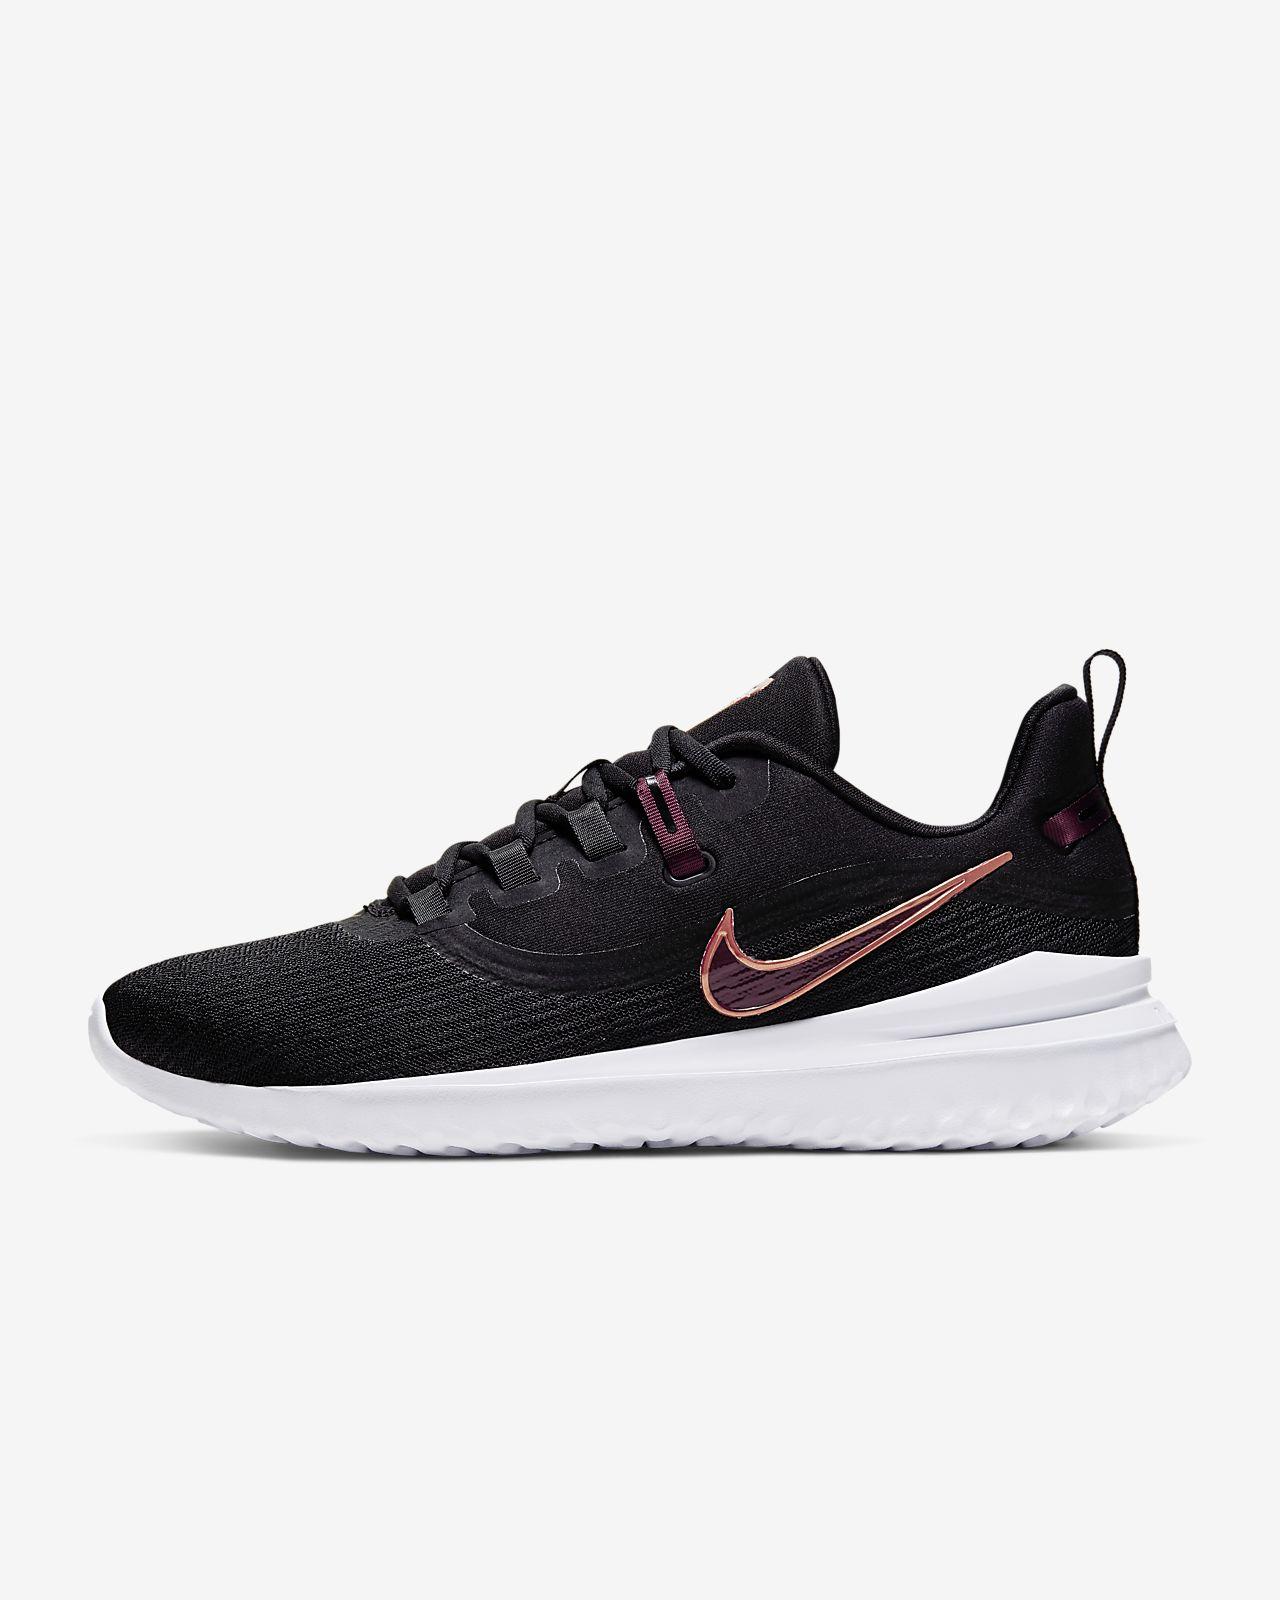 Chaussure de running Nike Renew Rival 2 pour Femme